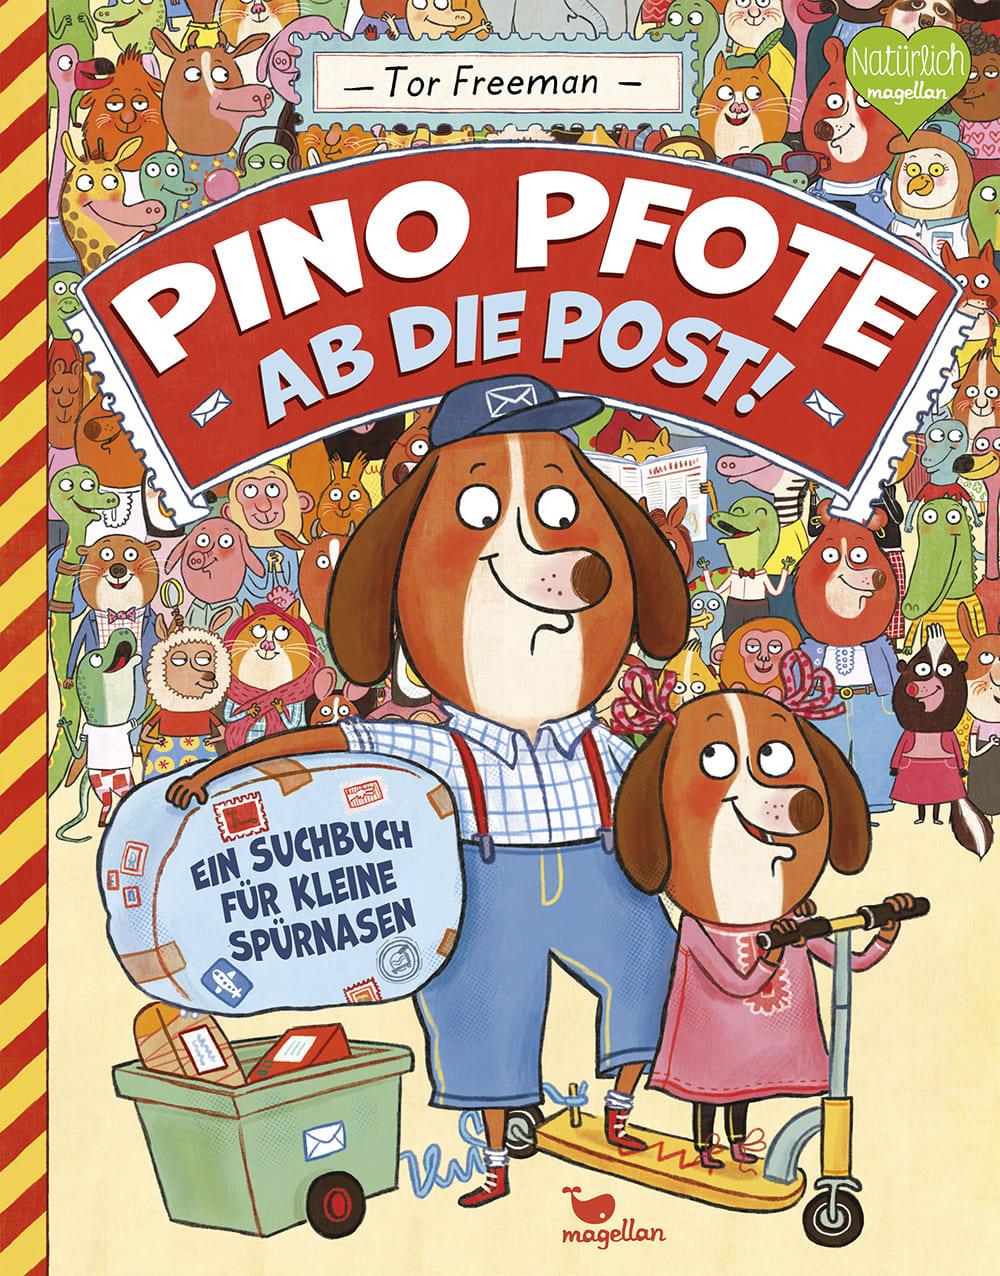 Pino Pfote - Ab die Post!